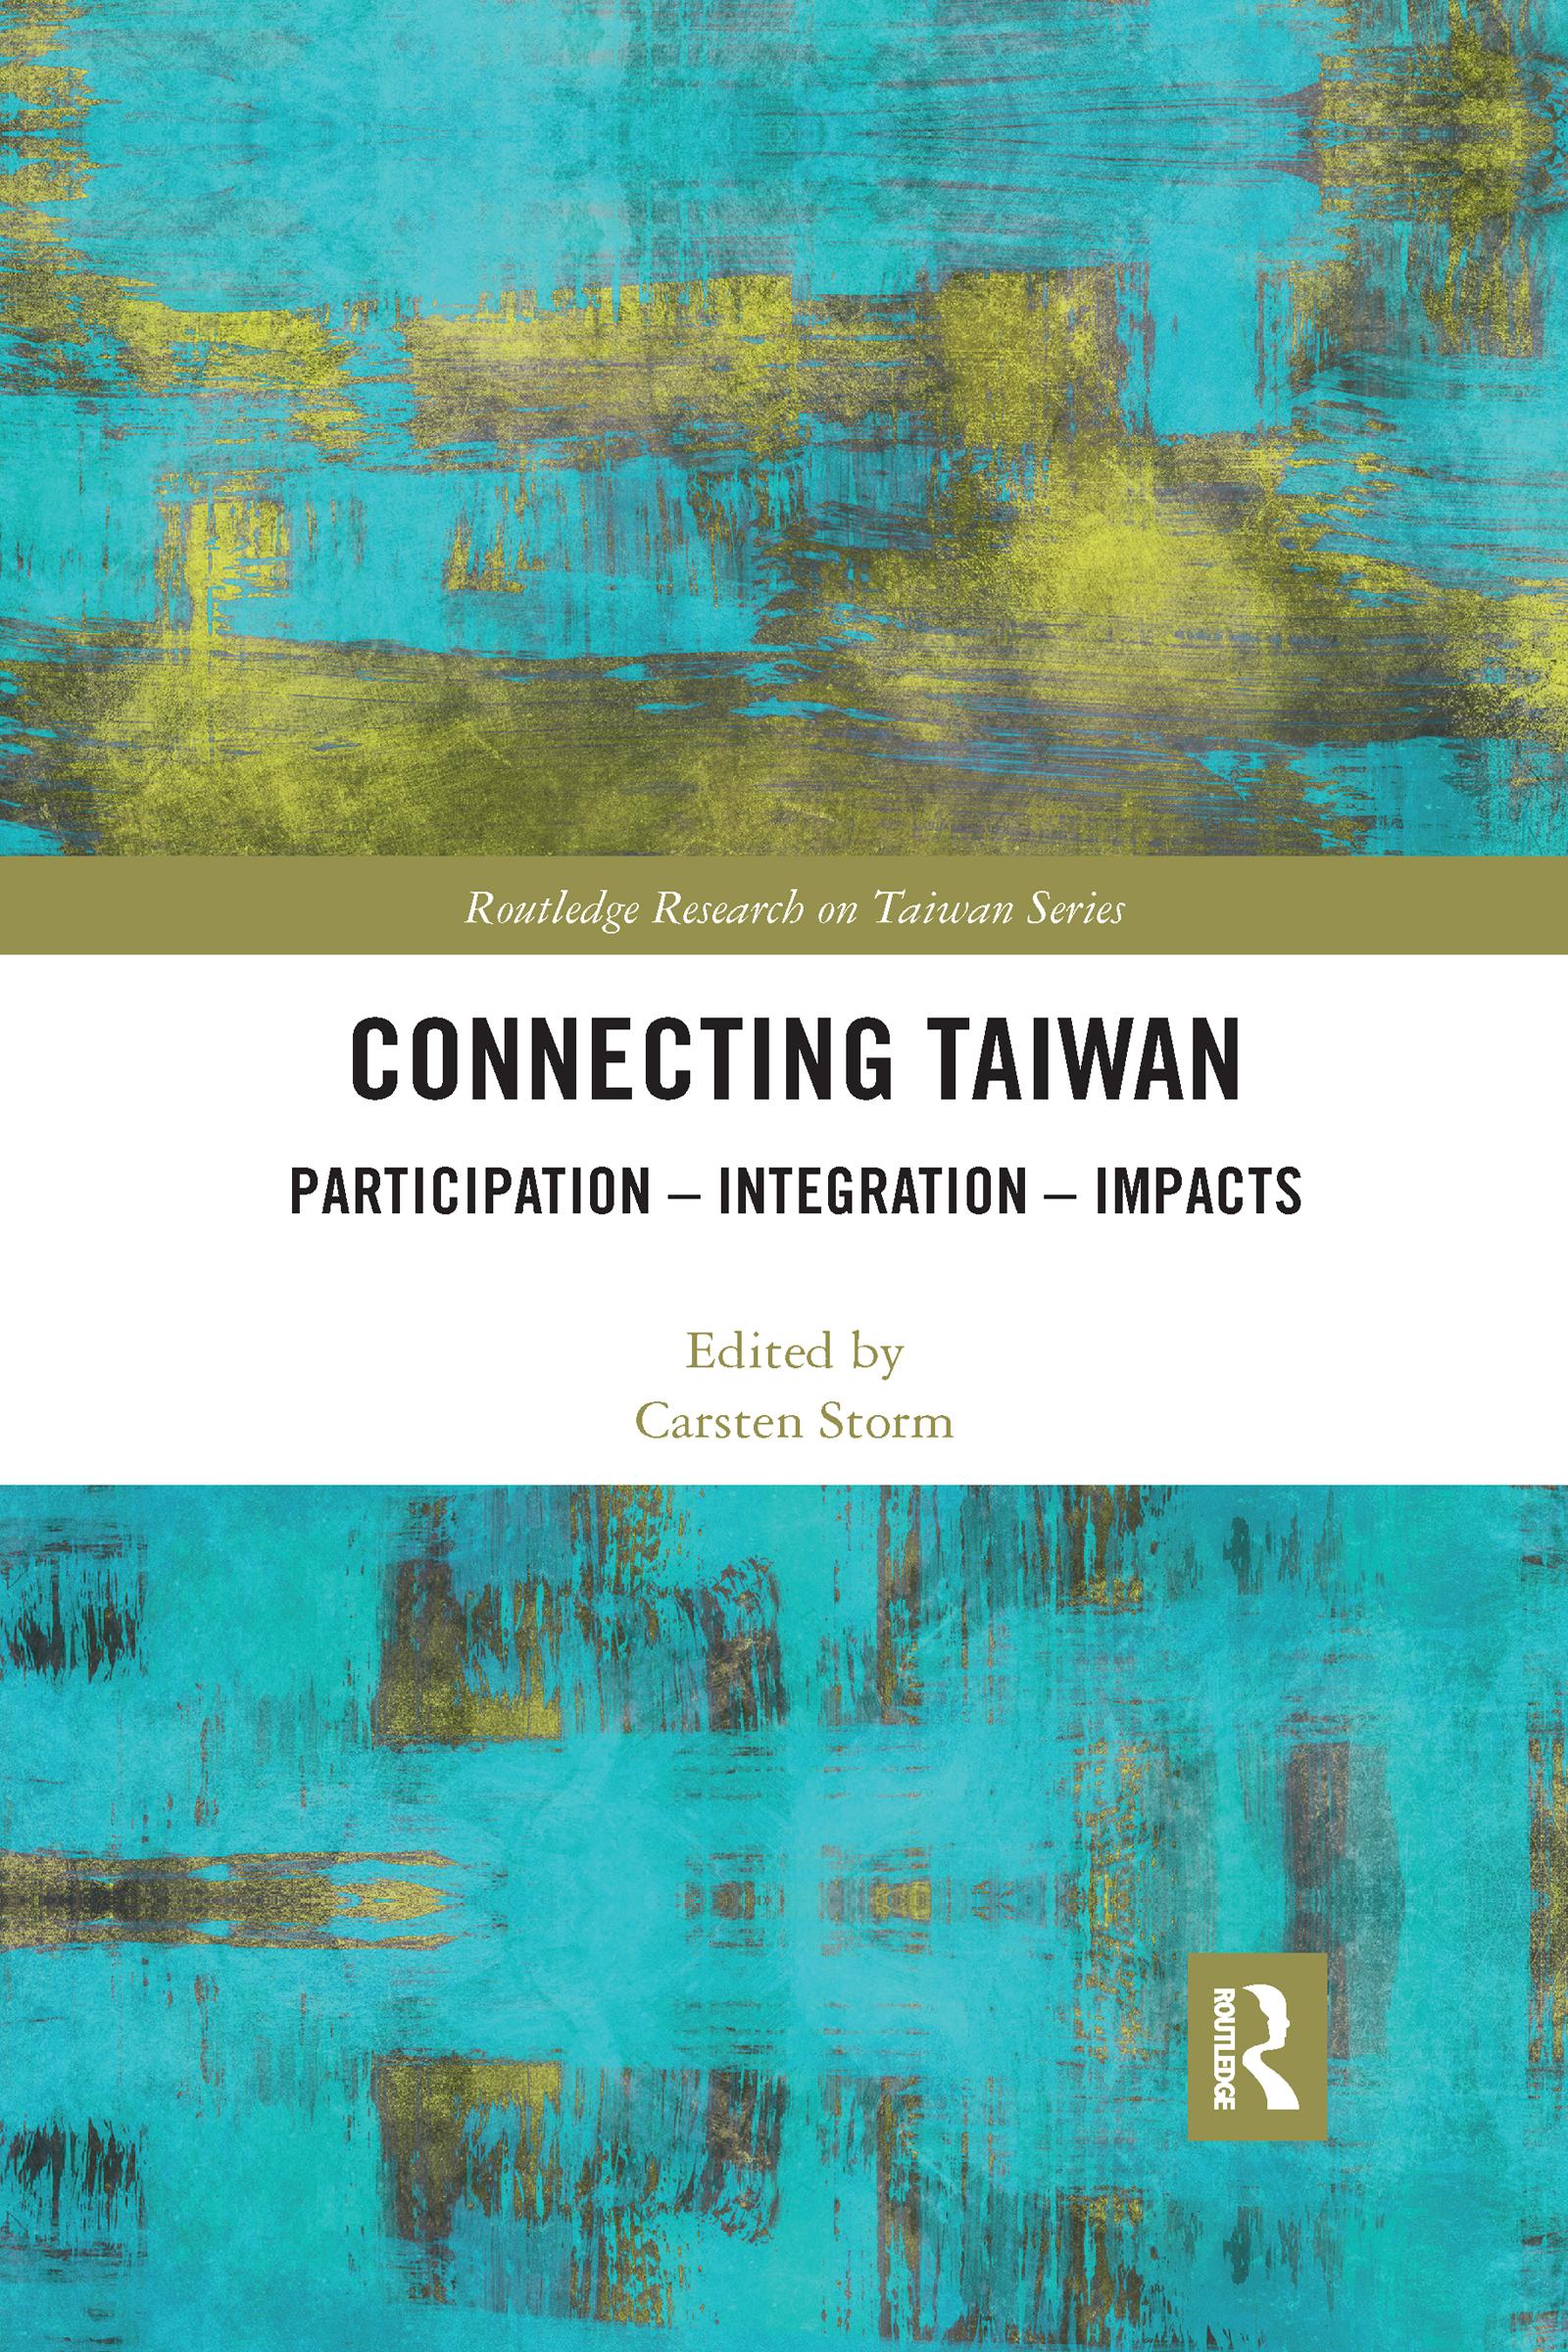 Connecting Taiwan